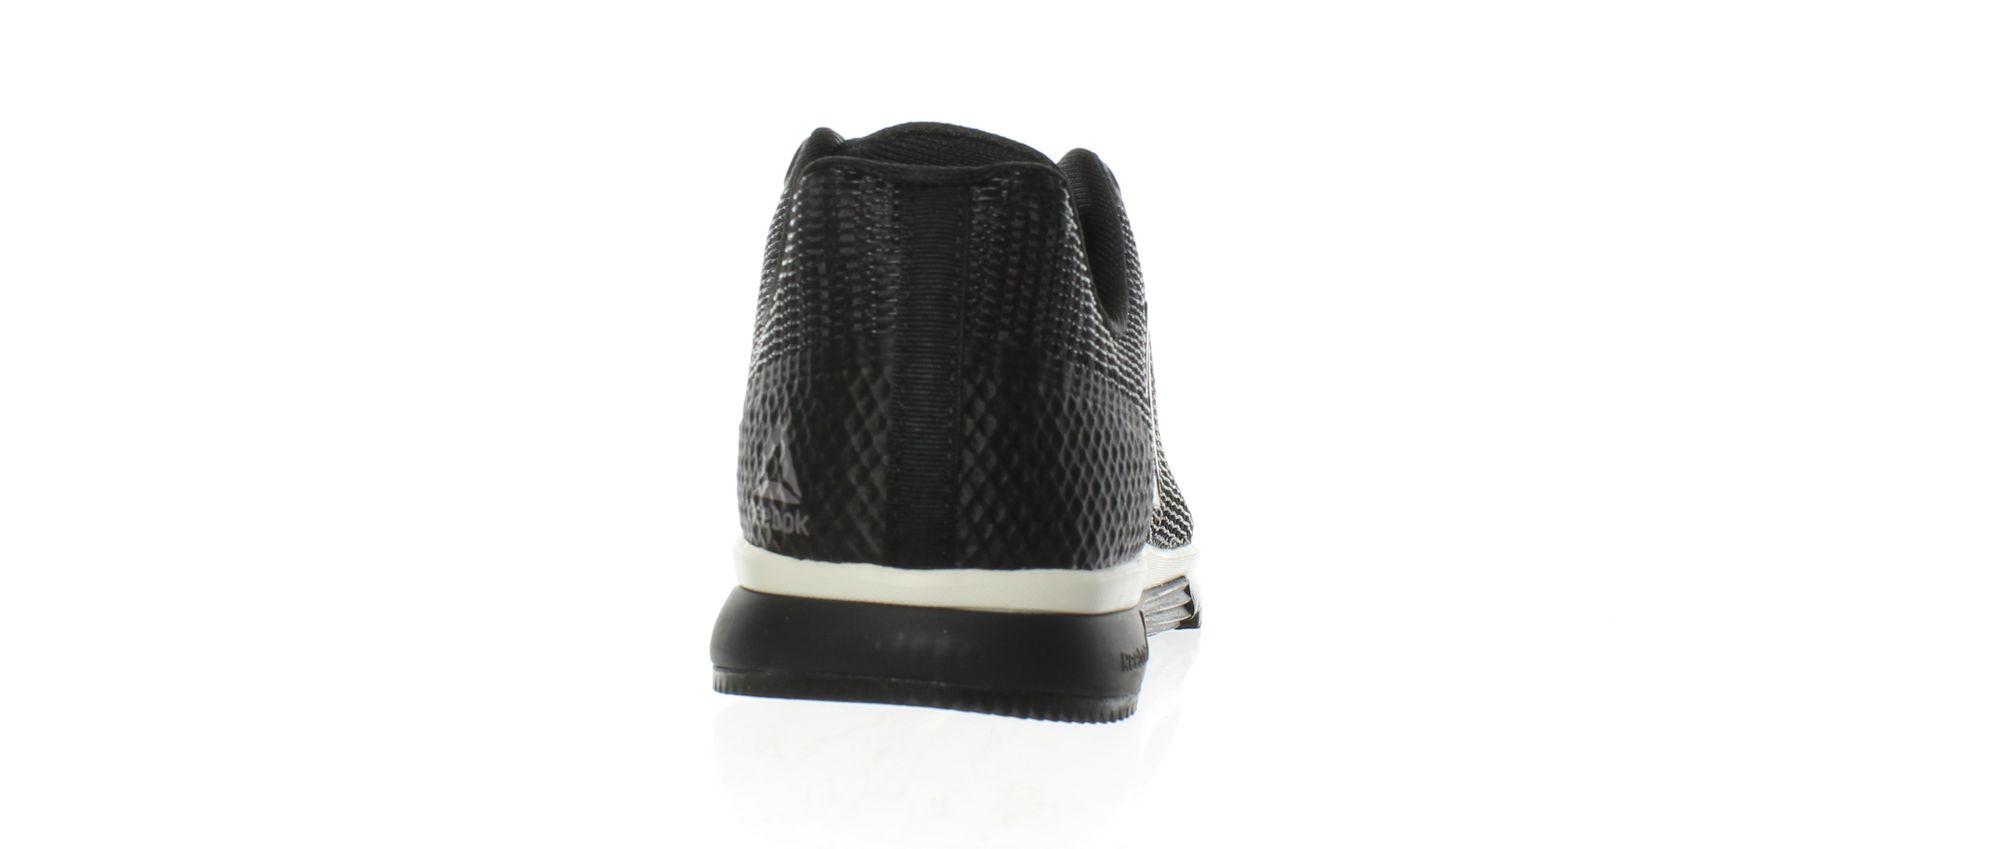 Reebok-Mens-Athletic-Speed-TR-Flexweave-Cross-Training-Shoes thumbnail 8